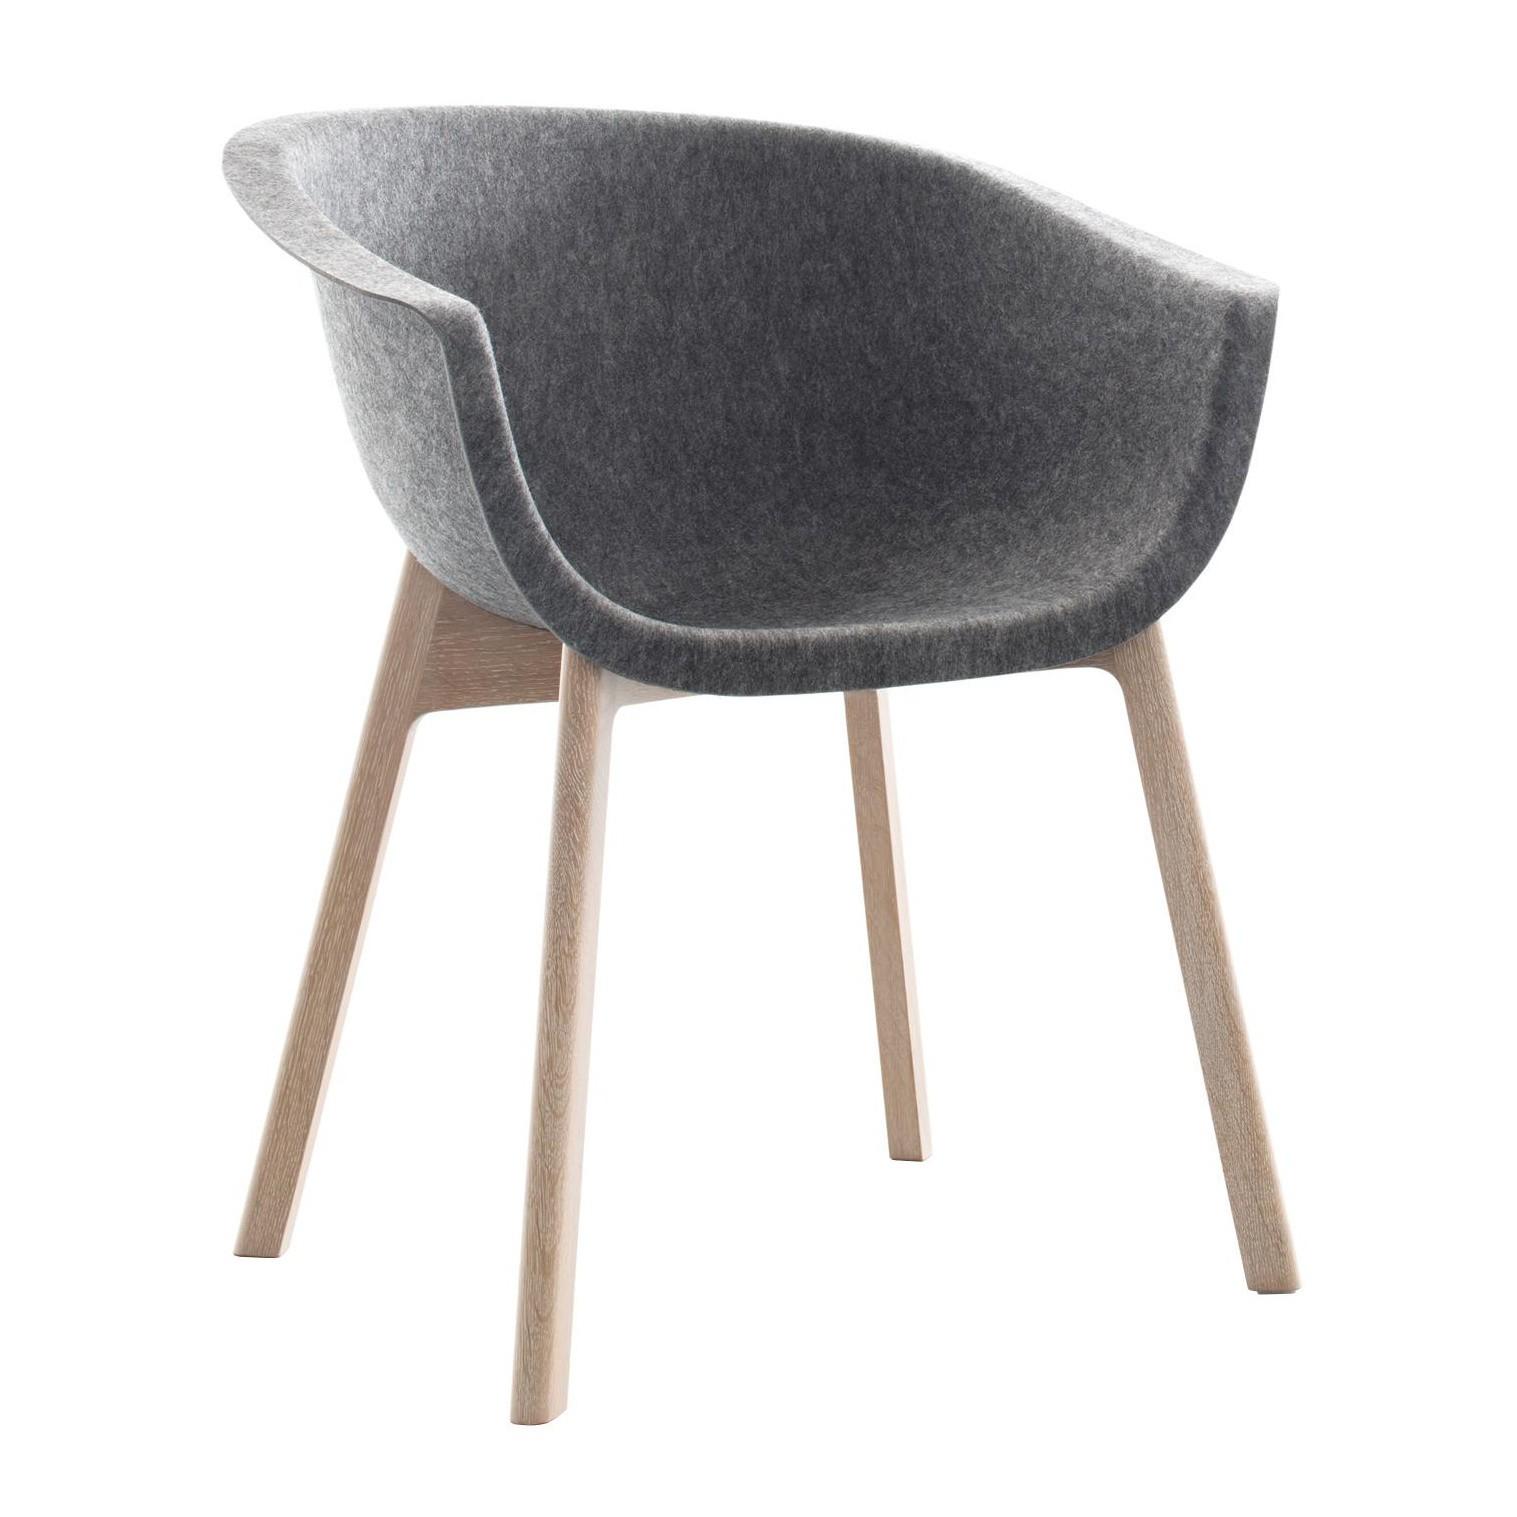 conmoto chairman armchair wood ambientedirect rh ambientedirect com